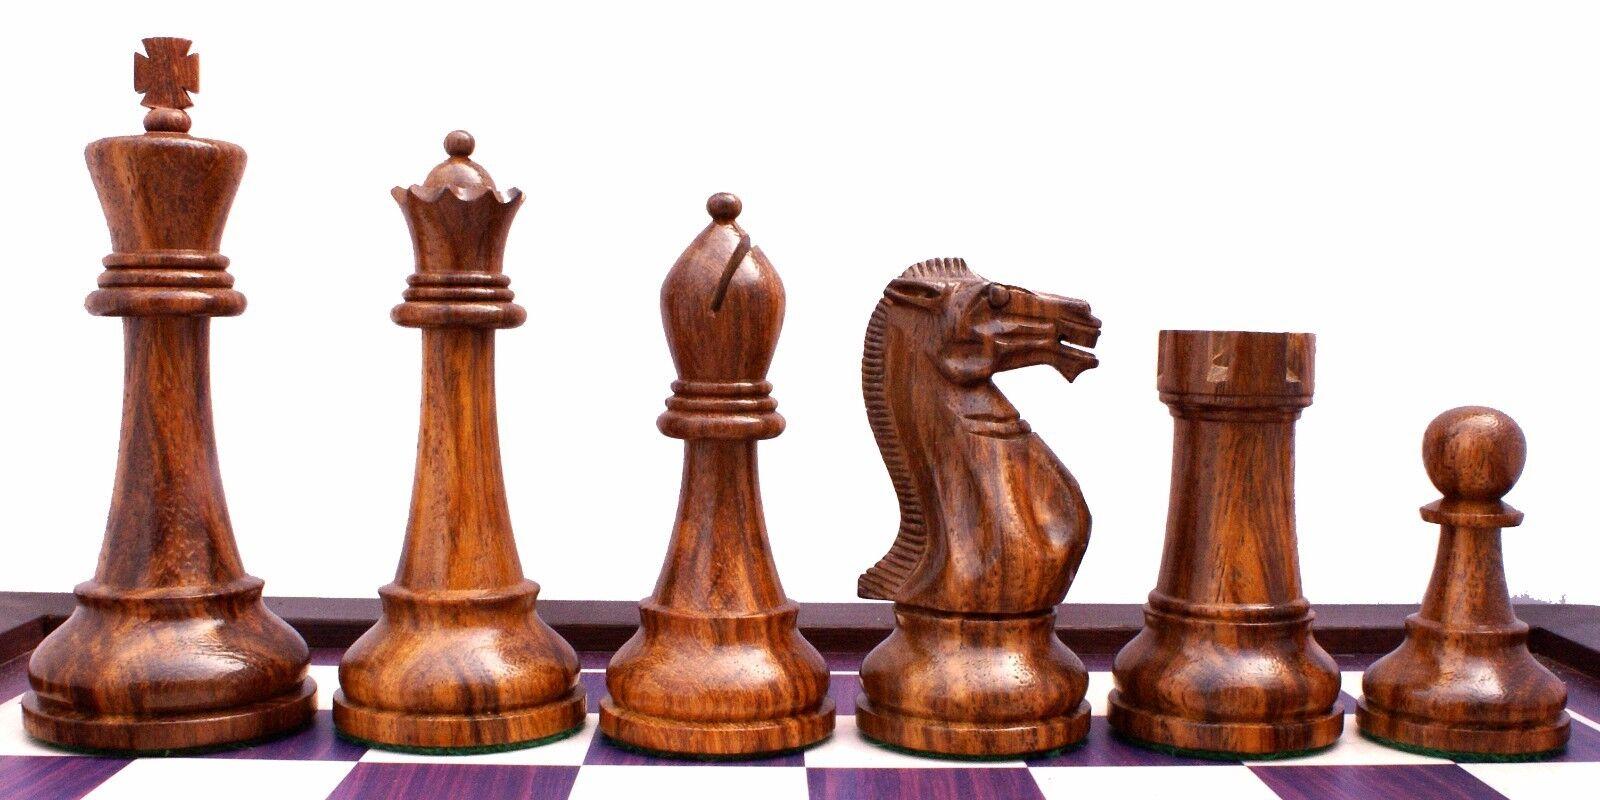 Verona Series Premium Staunton 4   ChessHommes in oren Rose bois & Box bois  vente chaude en ligne